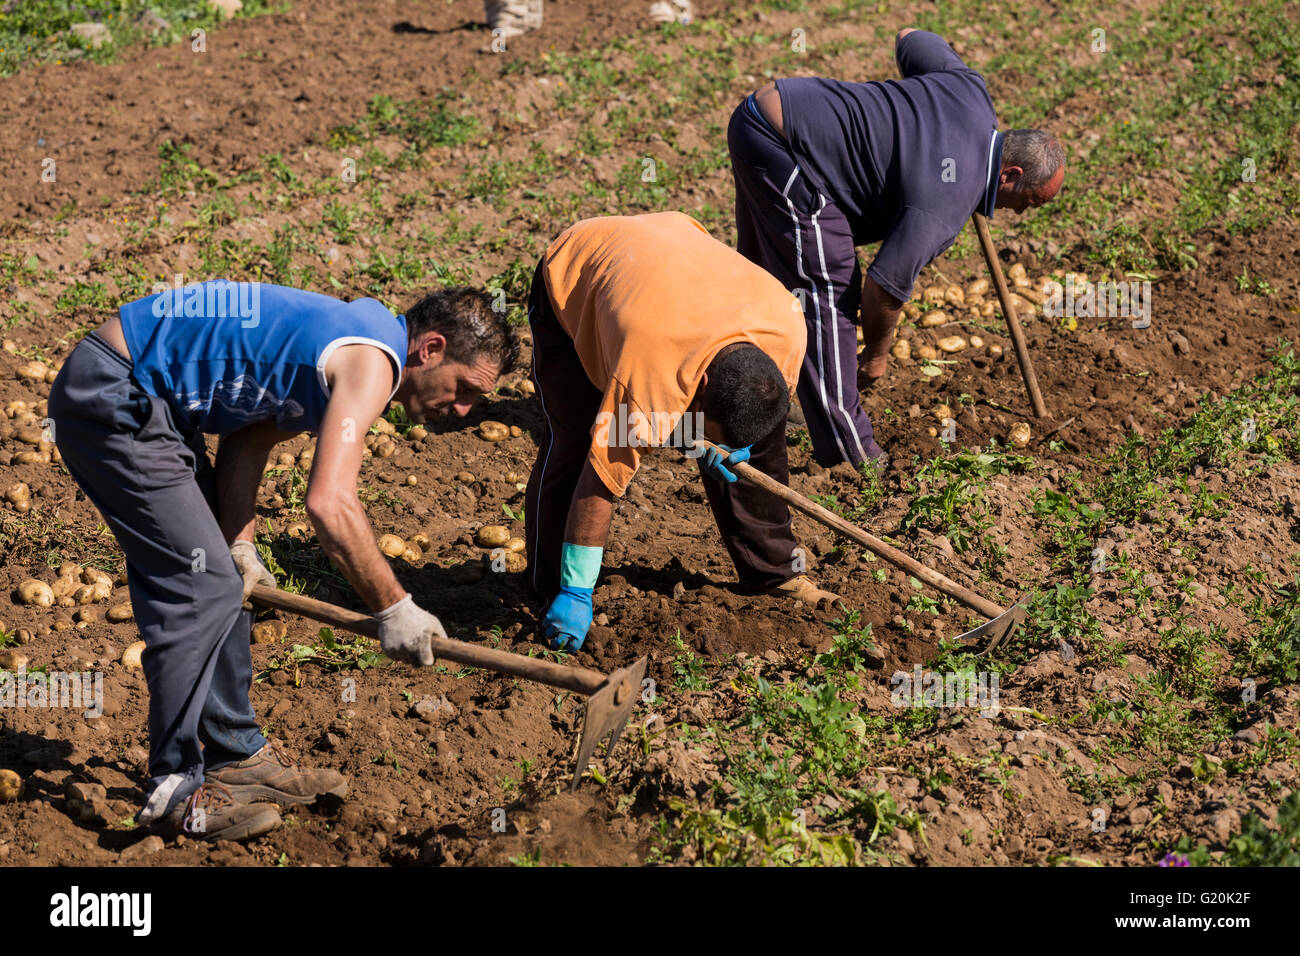 Spanish Farm Workers In Countryside Stock Photos & Spanish Farm ...